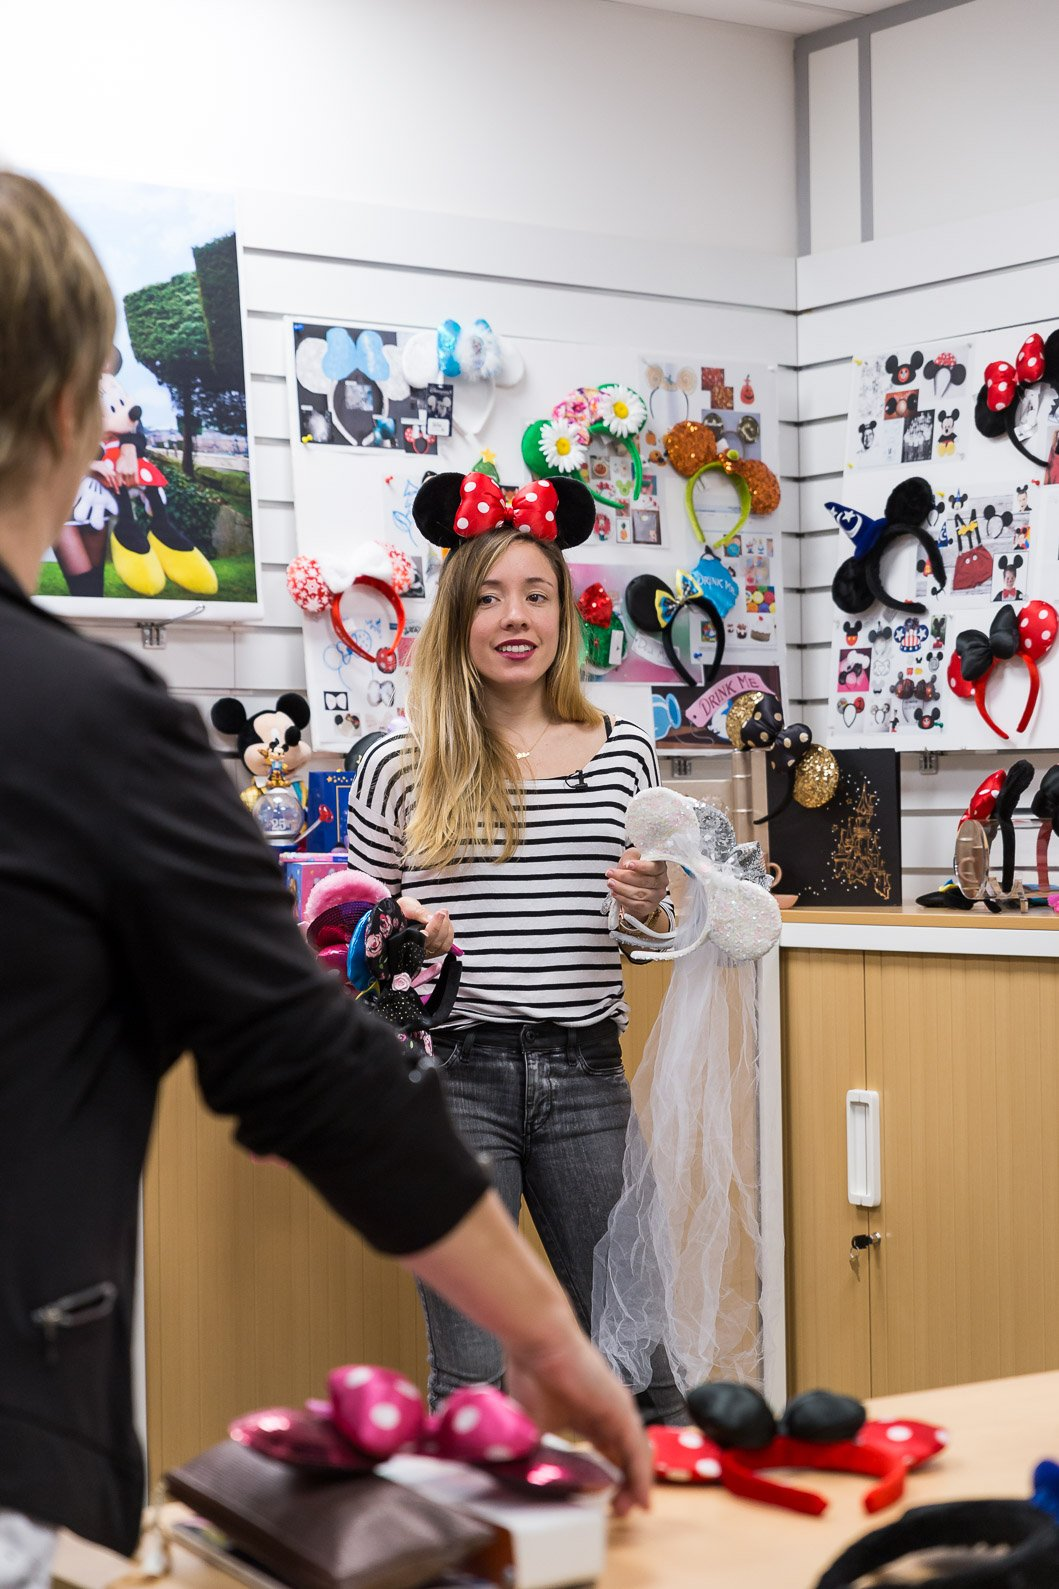 Coulisses DisneyLand Paris oreilles Minnie